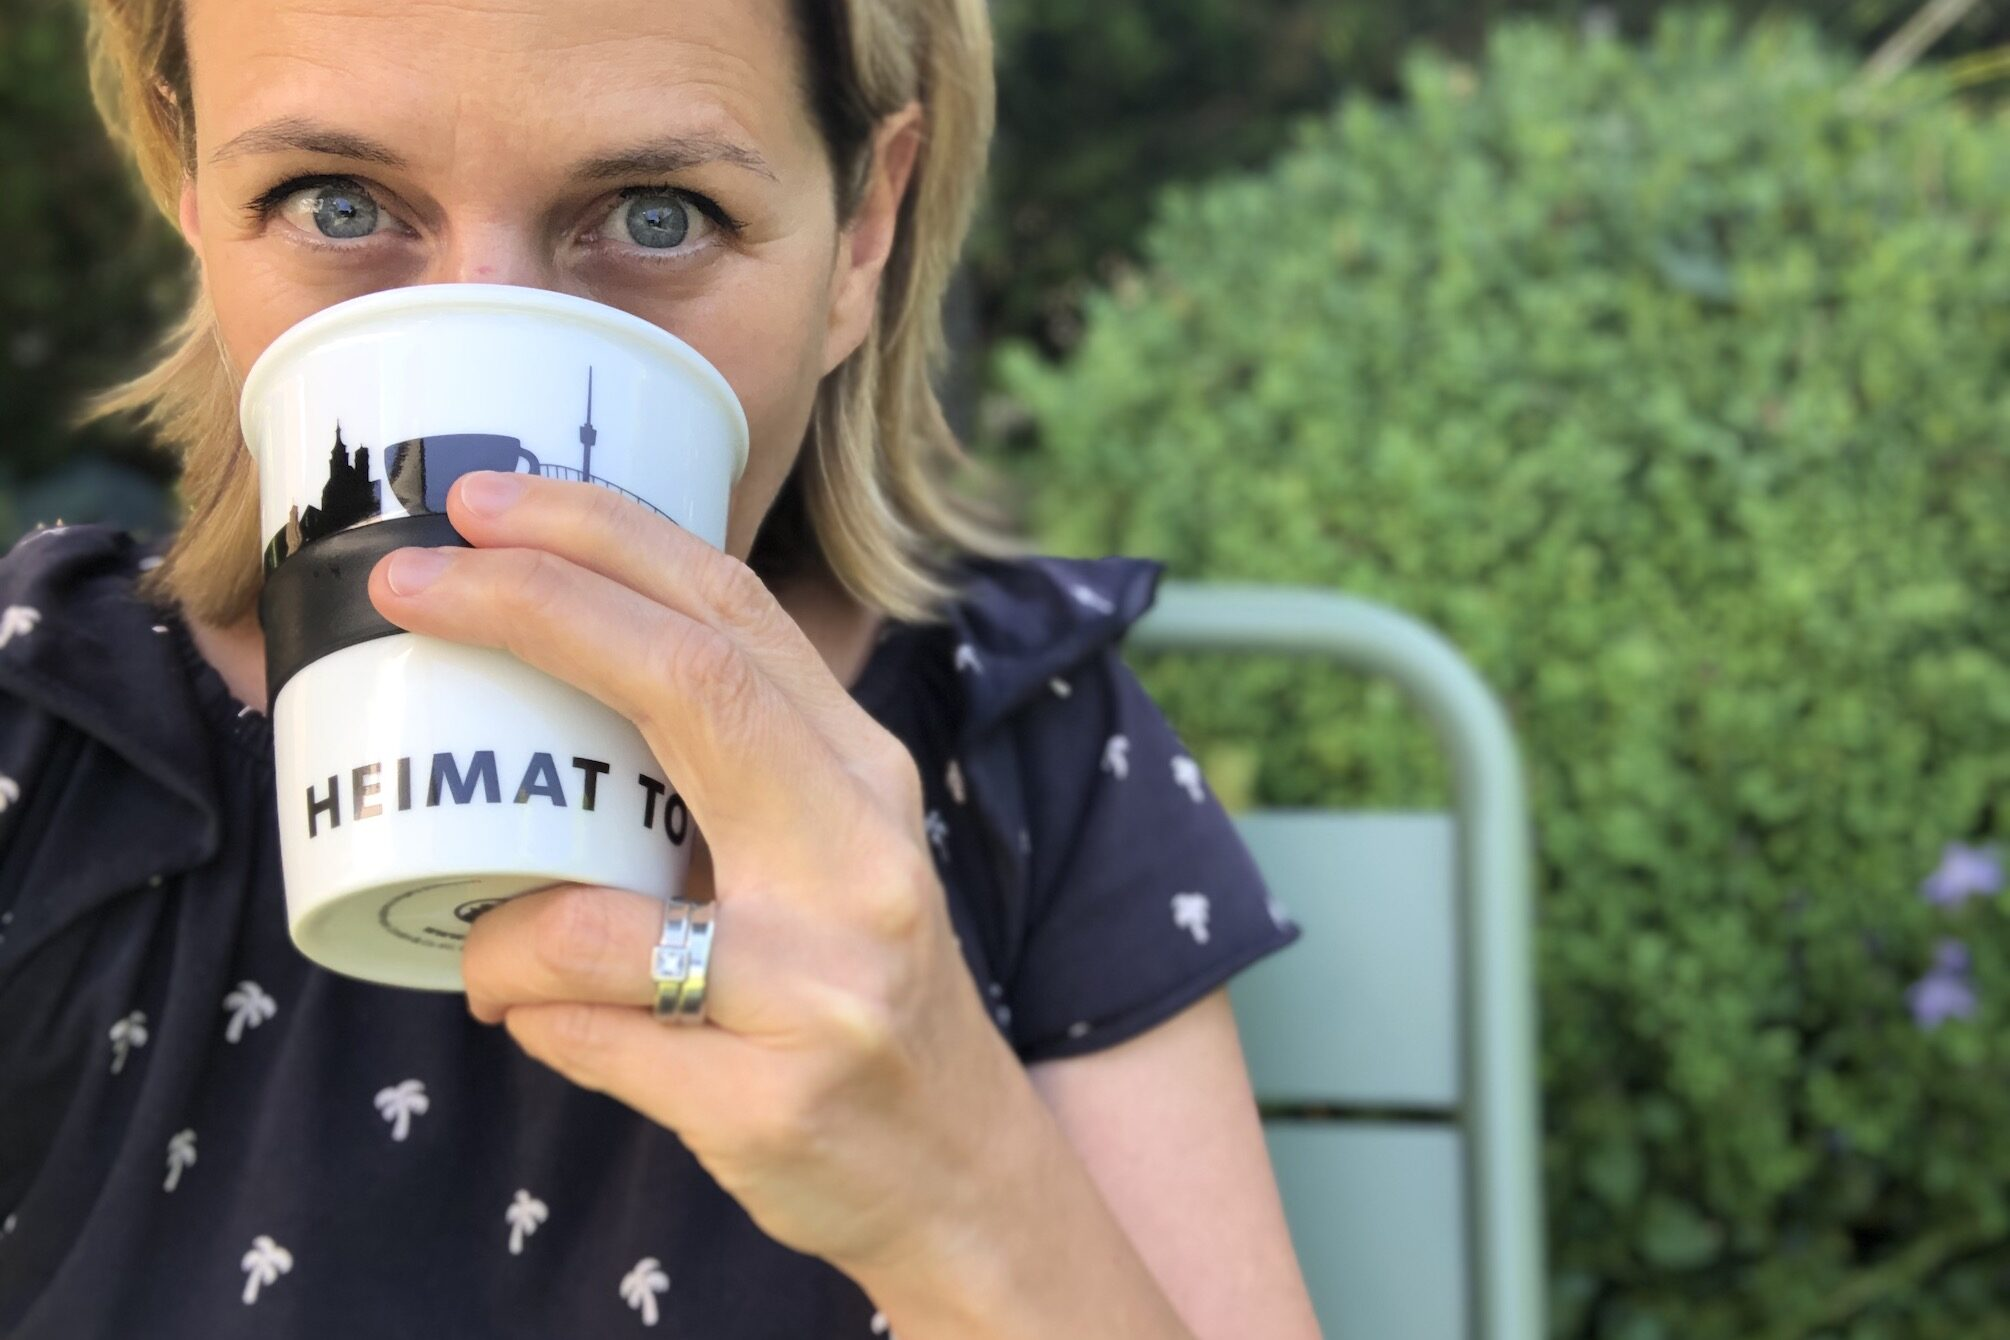 Heimat to go - www.expatmamas.de/blog/ #expatmamas #imauslandzuhause #heimat